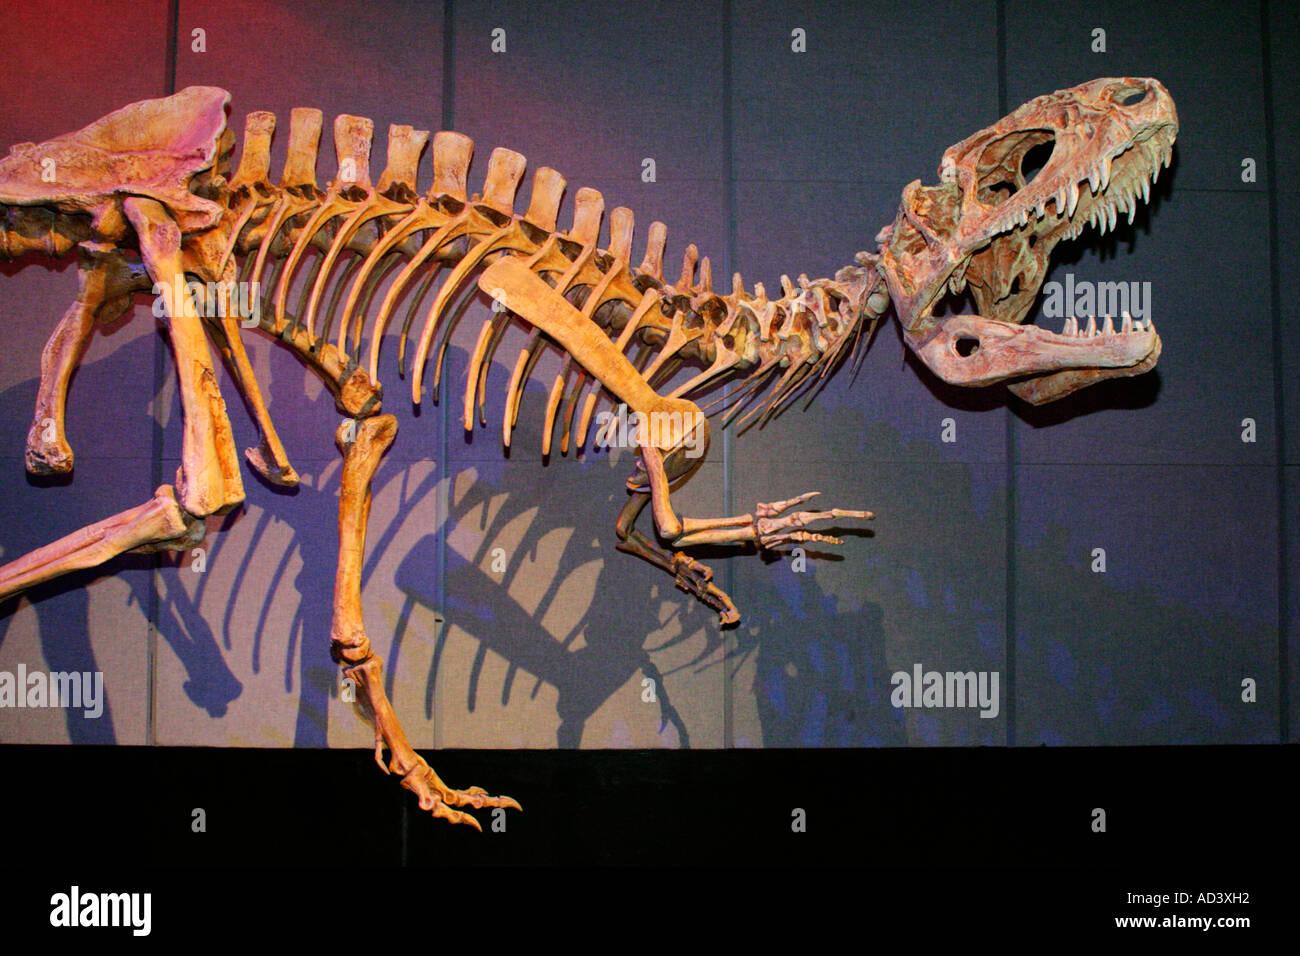 Skeletal structure replica of Tyrannosaurus Rex dinosaur-Royal Tyrrell Museum, Drumheller, Alberta, Canada - Stock Image